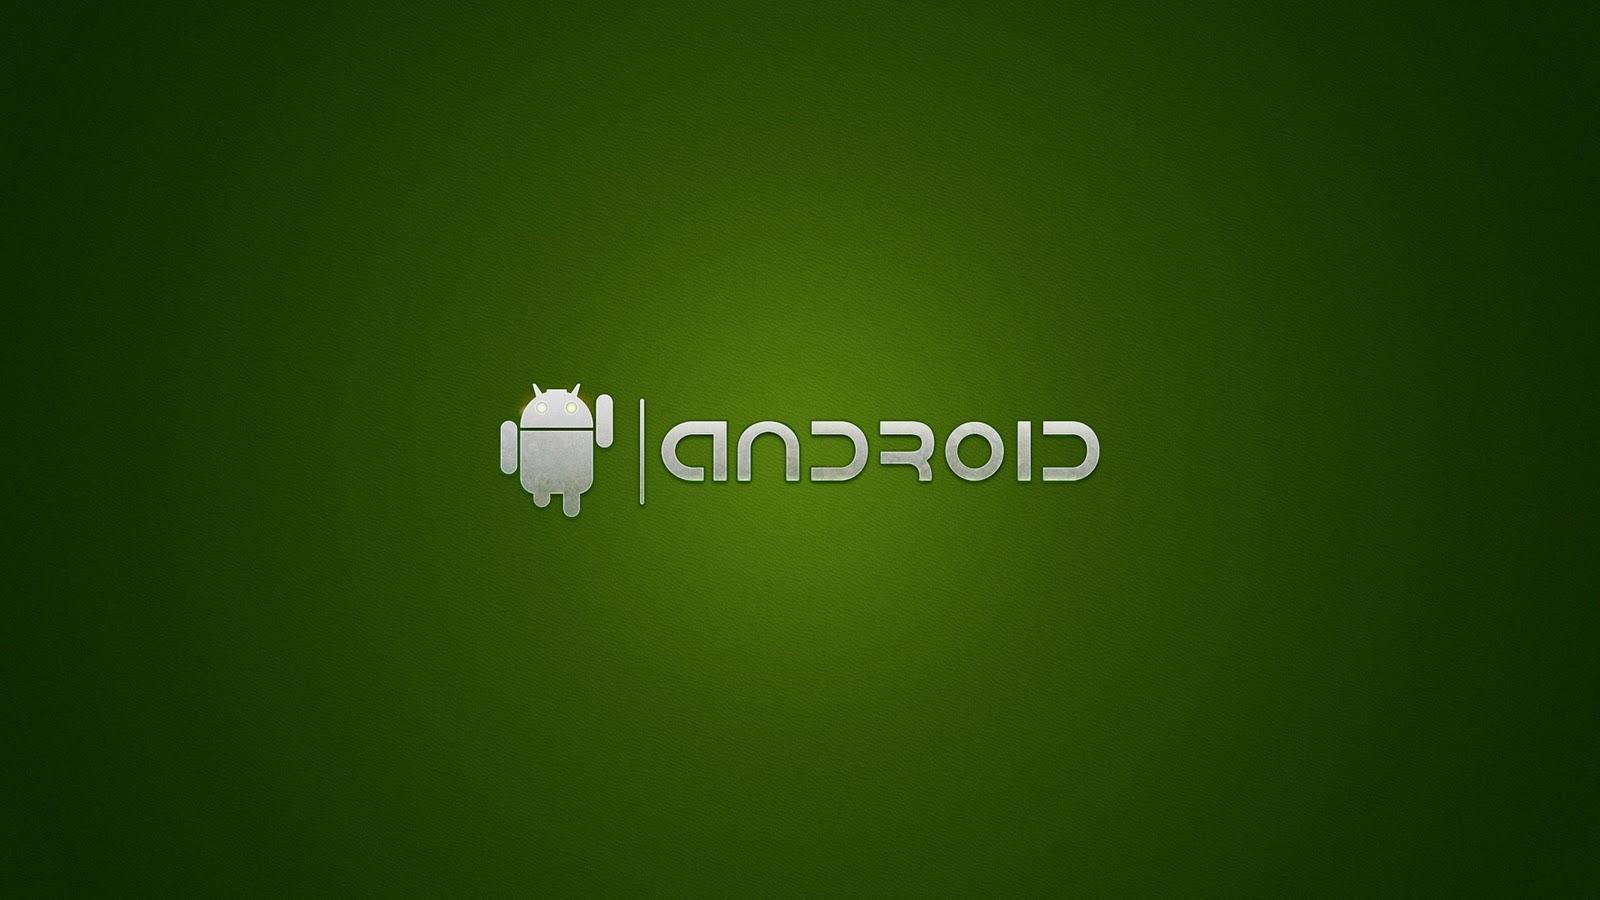 http://3.bp.blogspot.com/-h4D6JO8cDFI/TsUvcpIy33I/AAAAAAAAA7w/WdwQqHMfpnE/s1600/android_wallpaper-HD.jpg